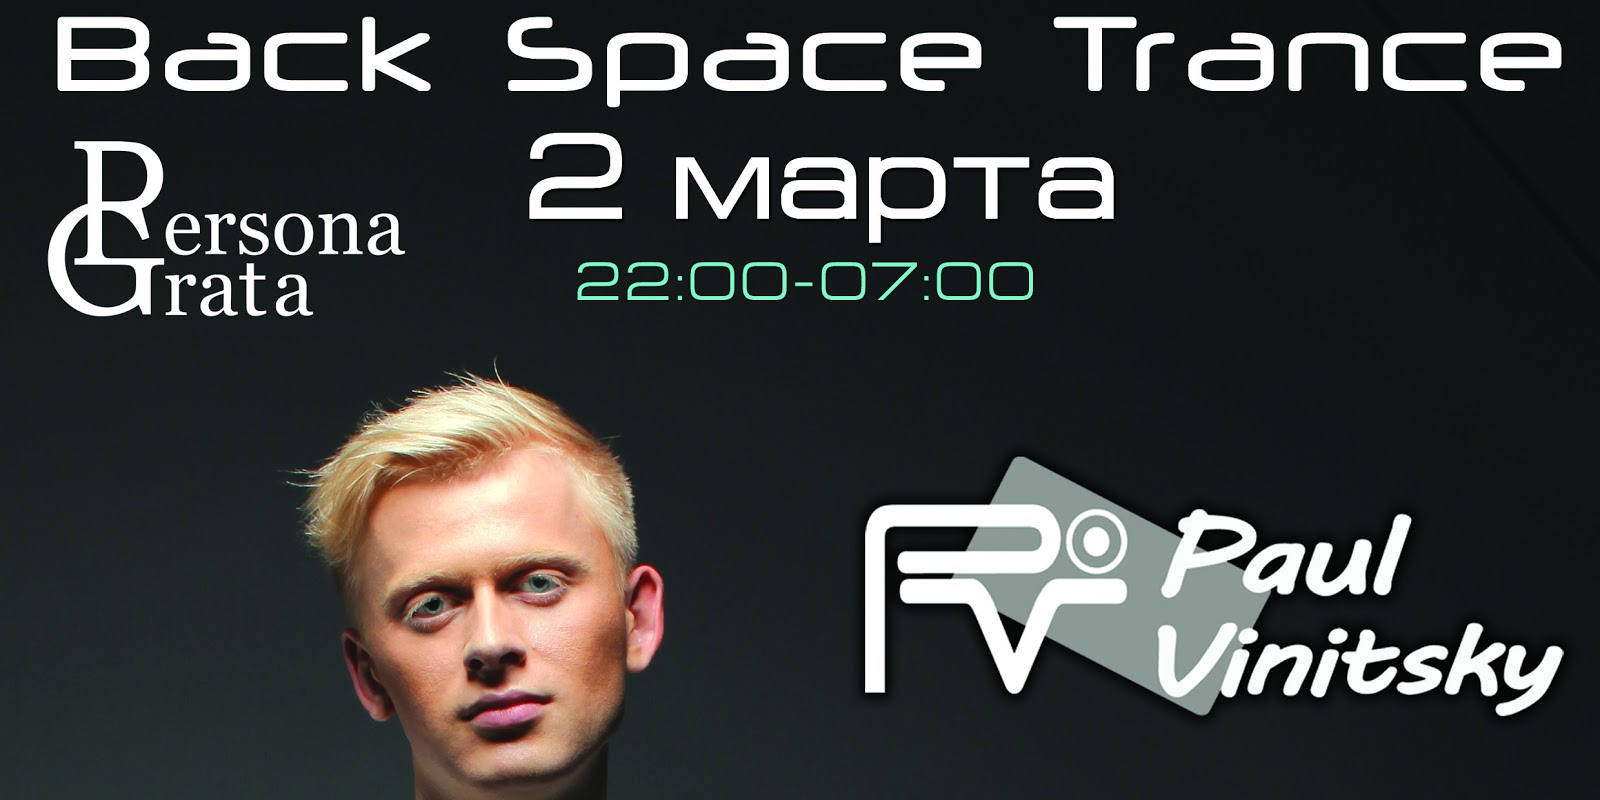 Back Space Trance, Москва, 02.03.13 + Конкурс